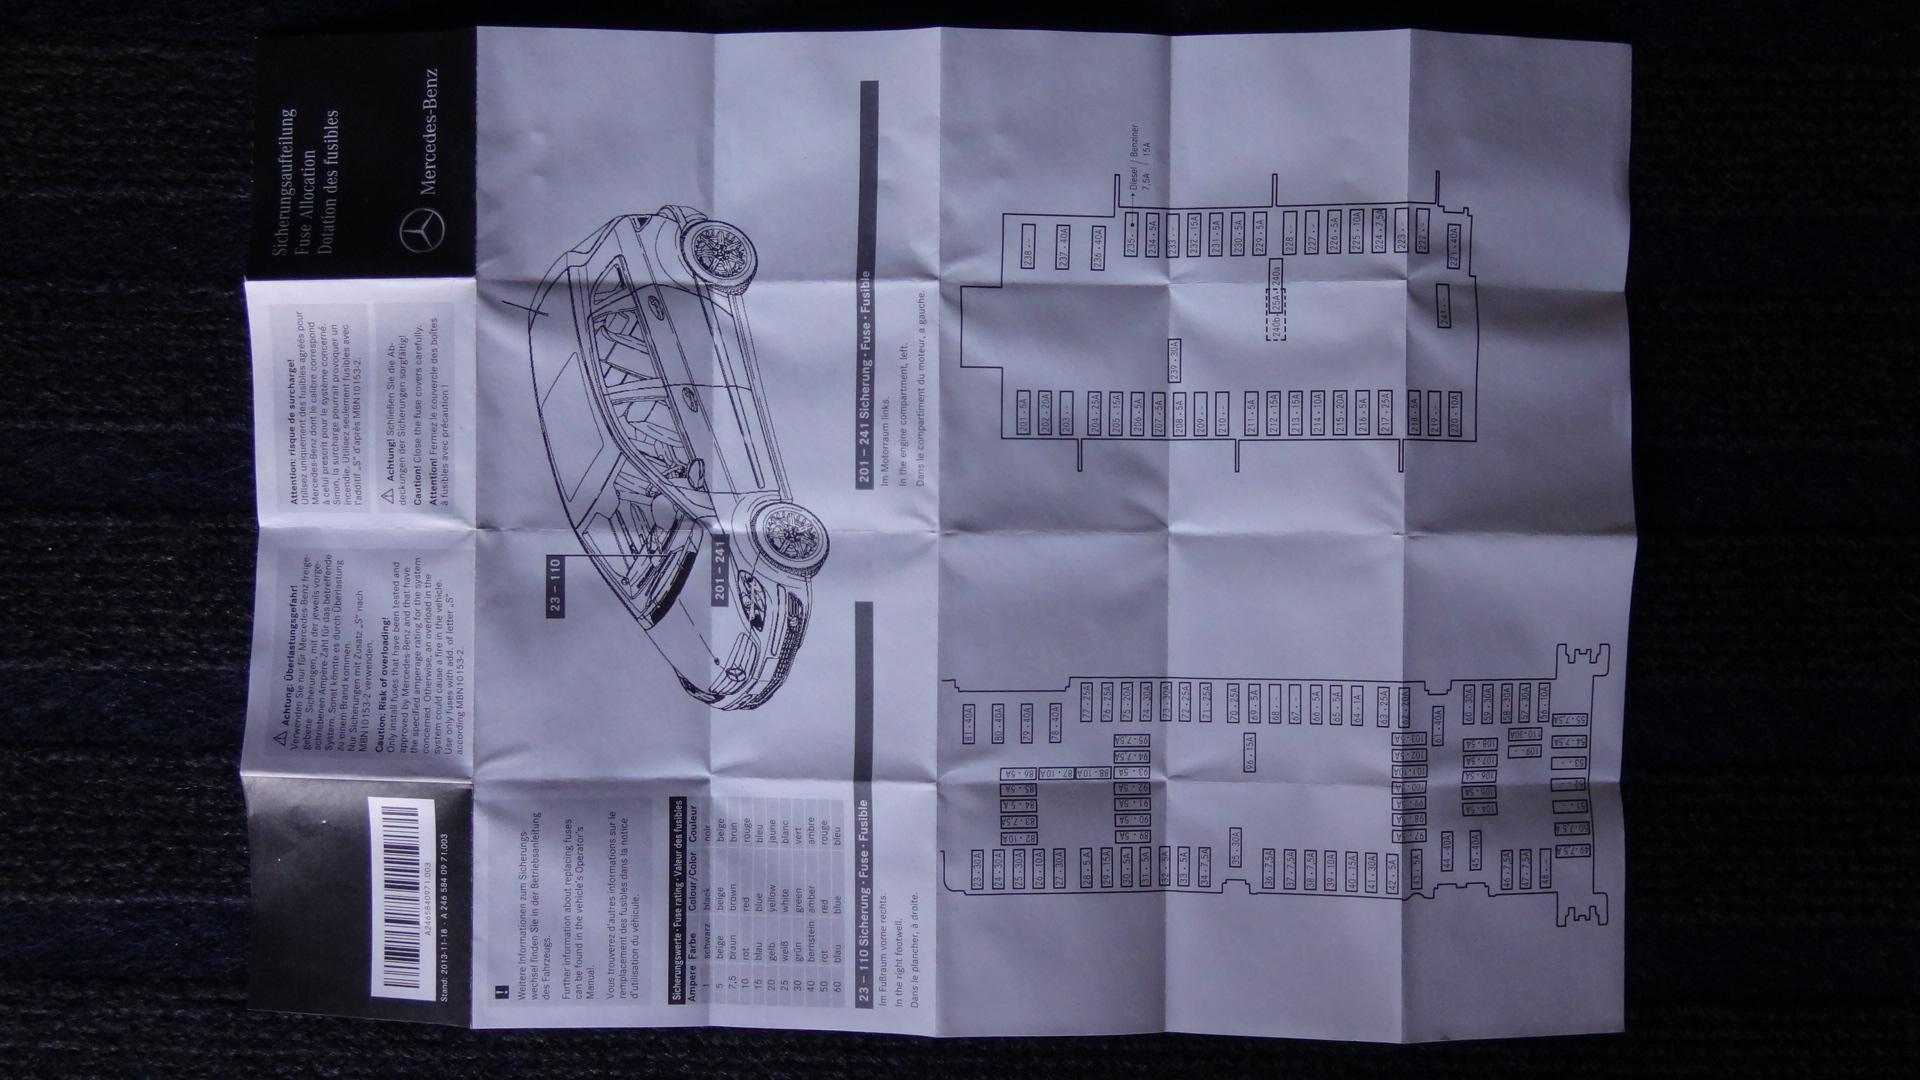 2001 jaguar s type wiring diagram gm3 drehzahlerfassung pull fuse box libraryname fusepaneldocument02 jpg views 1581 size 640 8 kb